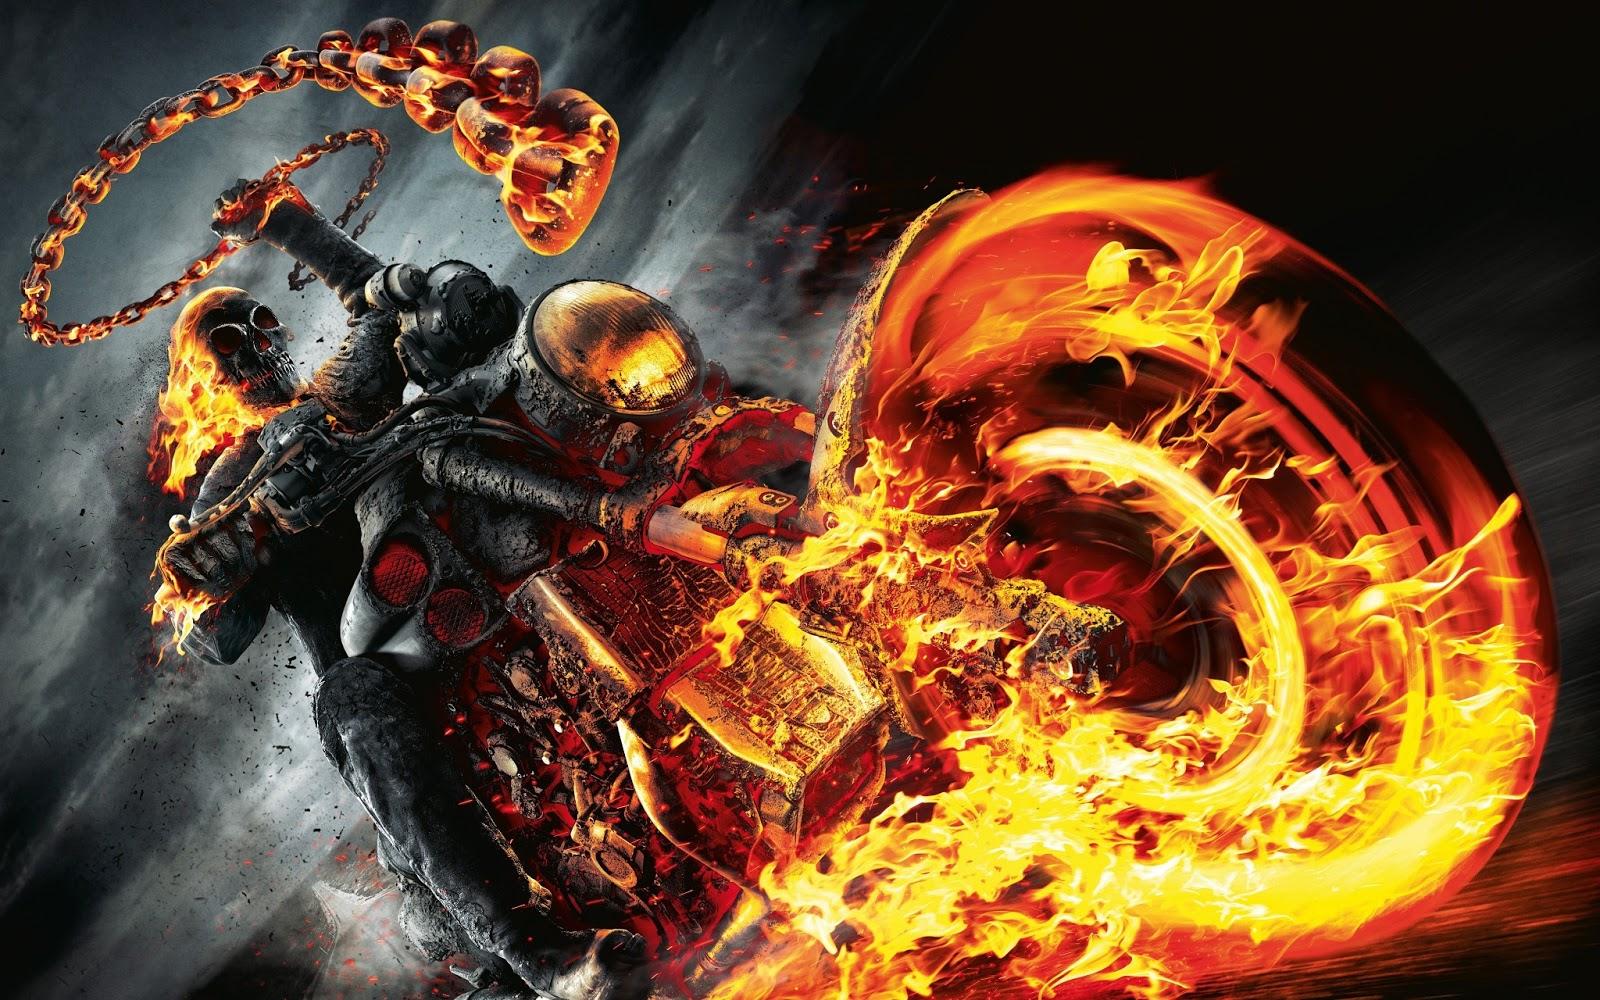 http://3.bp.blogspot.com/-6q_uOYcuSbg/UWwLkCvxuZI/AAAAAAAArgs/g8Rr9tFyLmE/s1600/Ghost+Rider+Wallpapers+(2).jpg